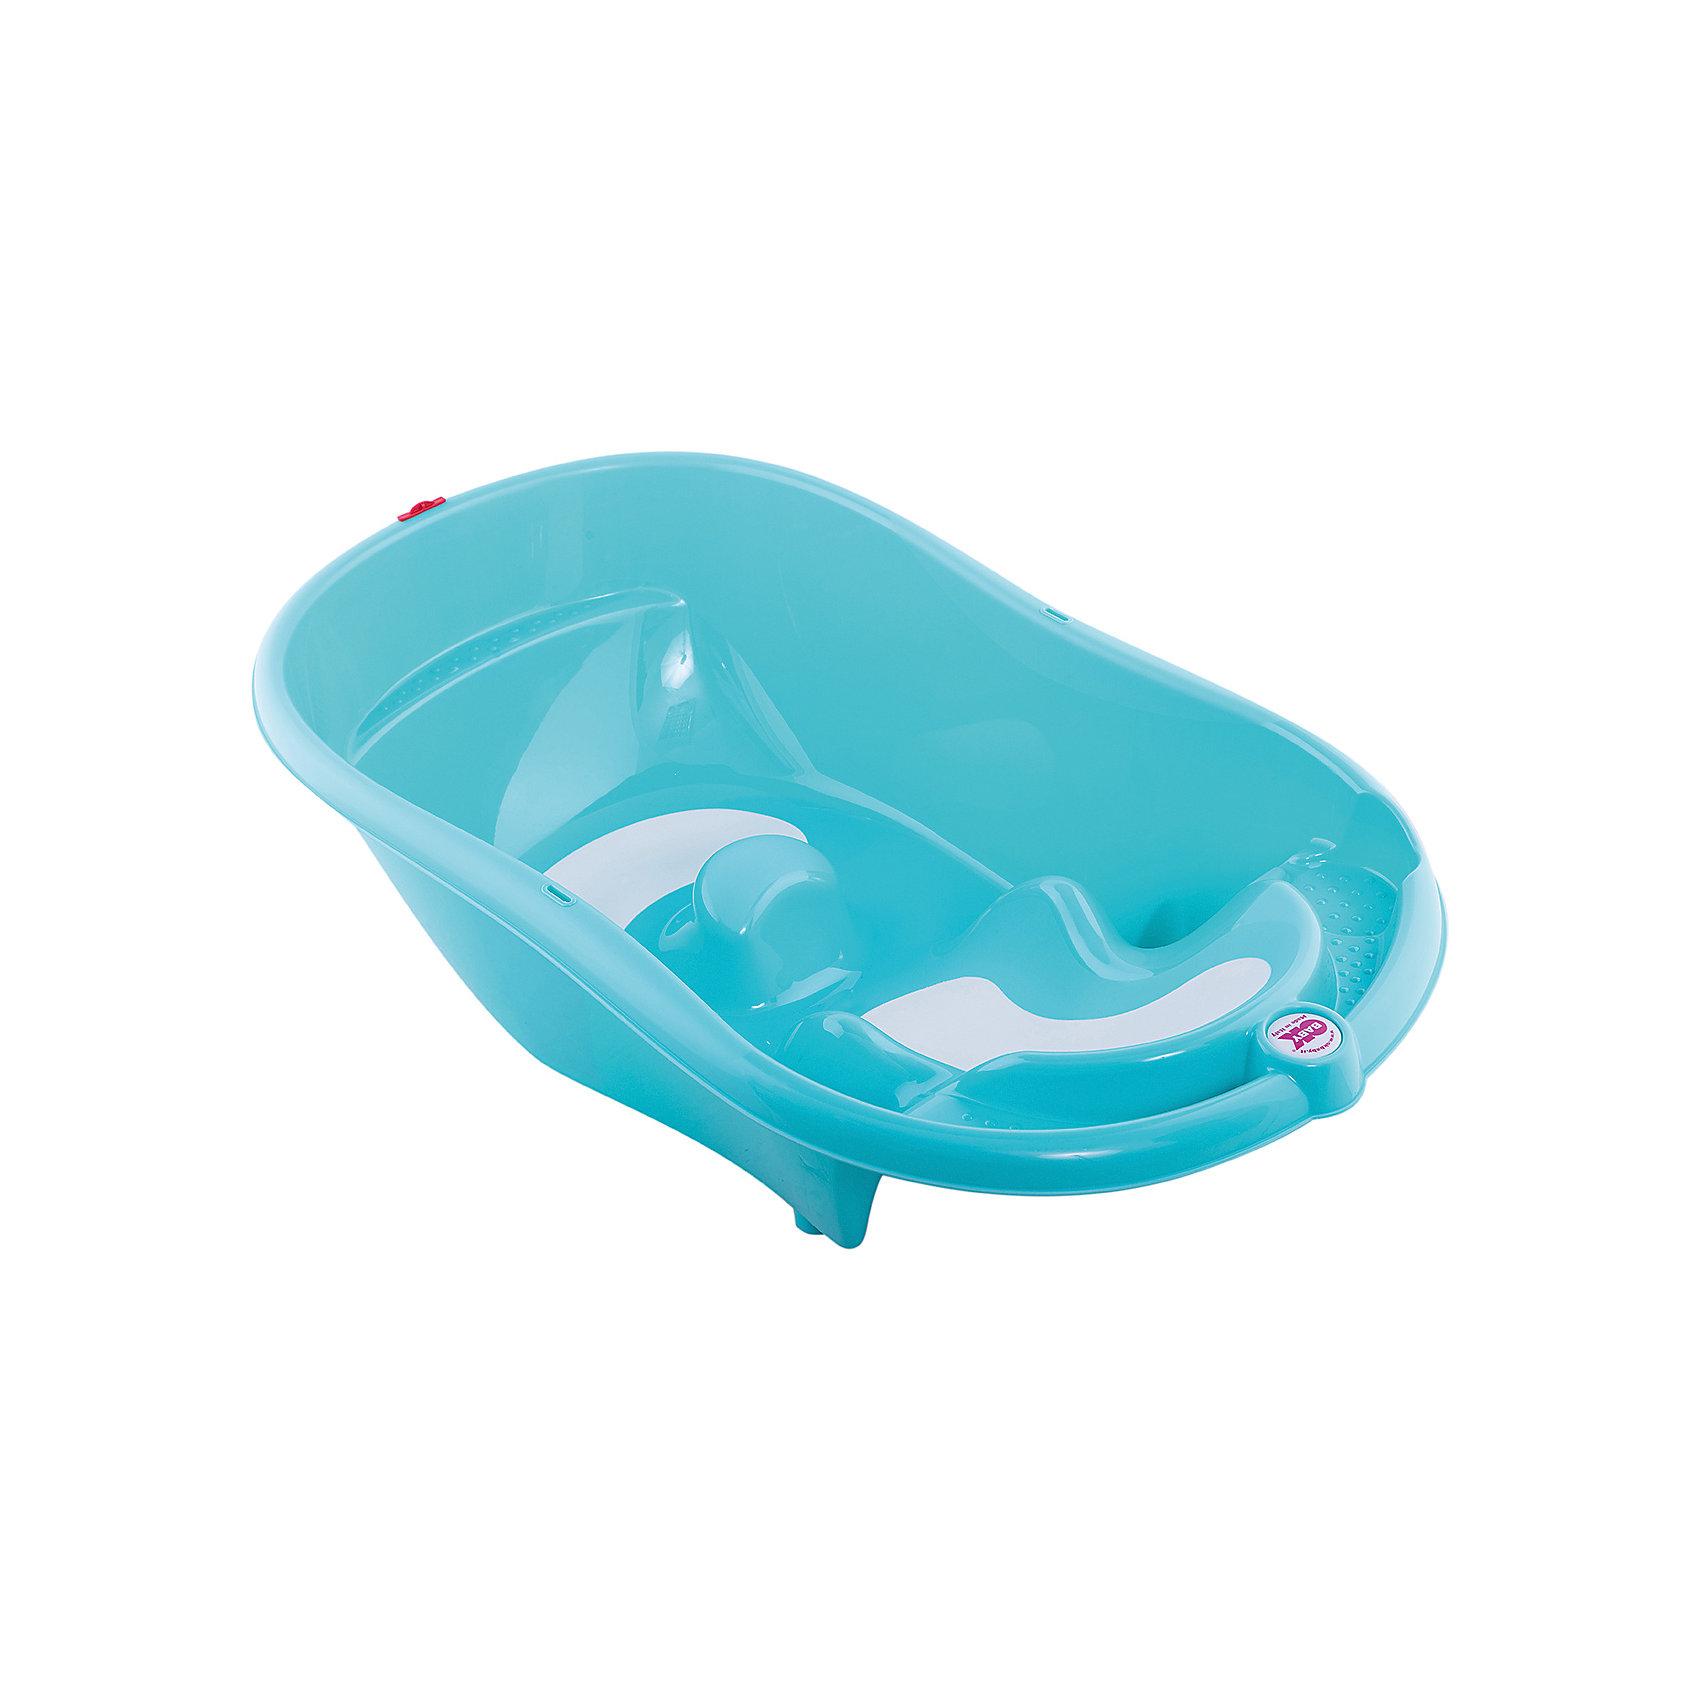 цены OK Baby Ванна Onda Evolution, OK Baby, синий прозрачный